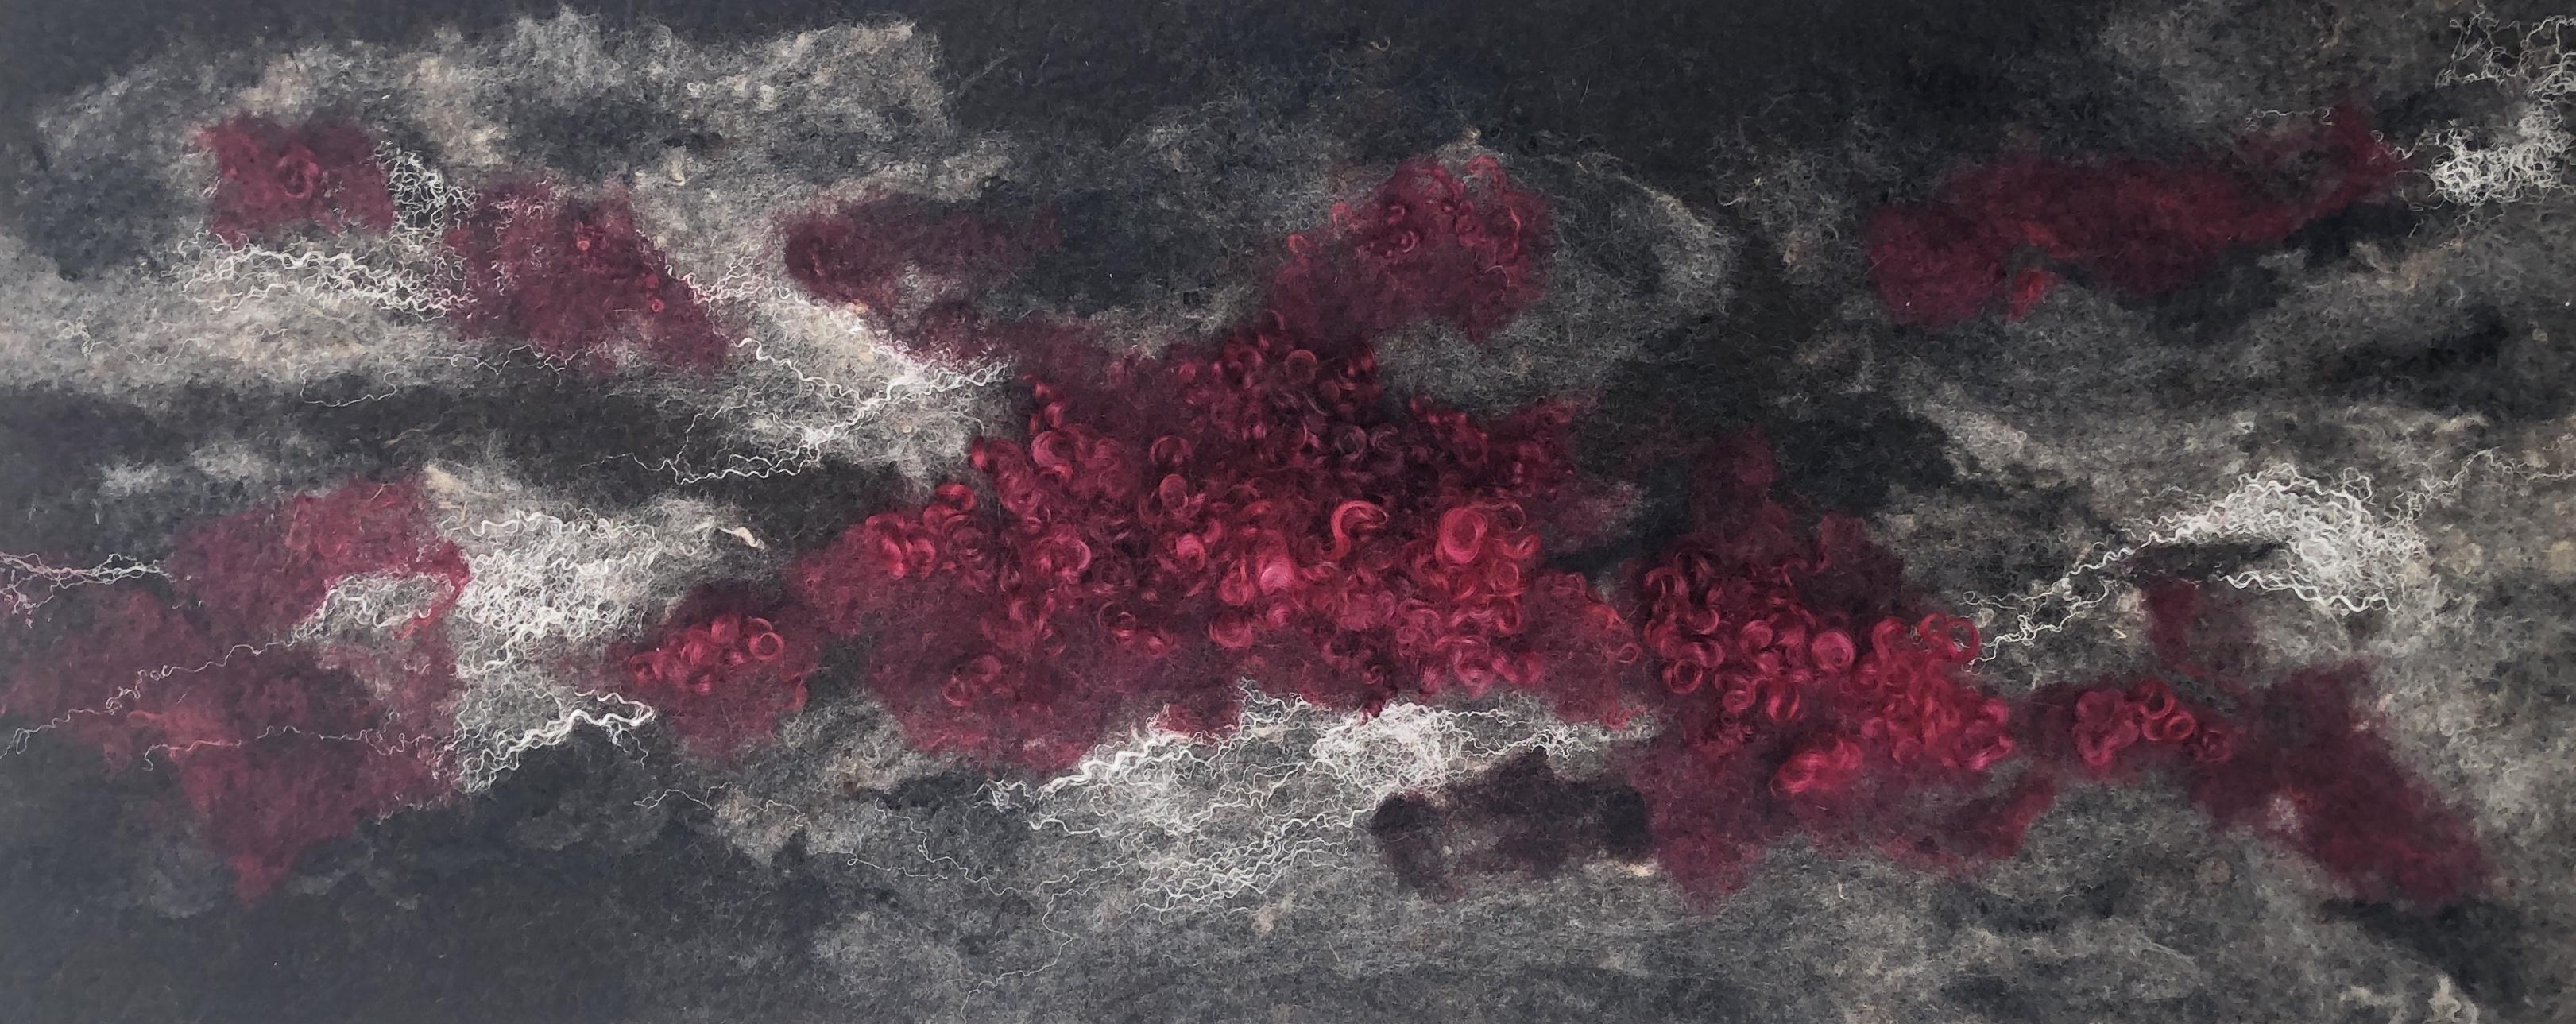 08-CCardinal-Terra Fuchsia-(horizontal).